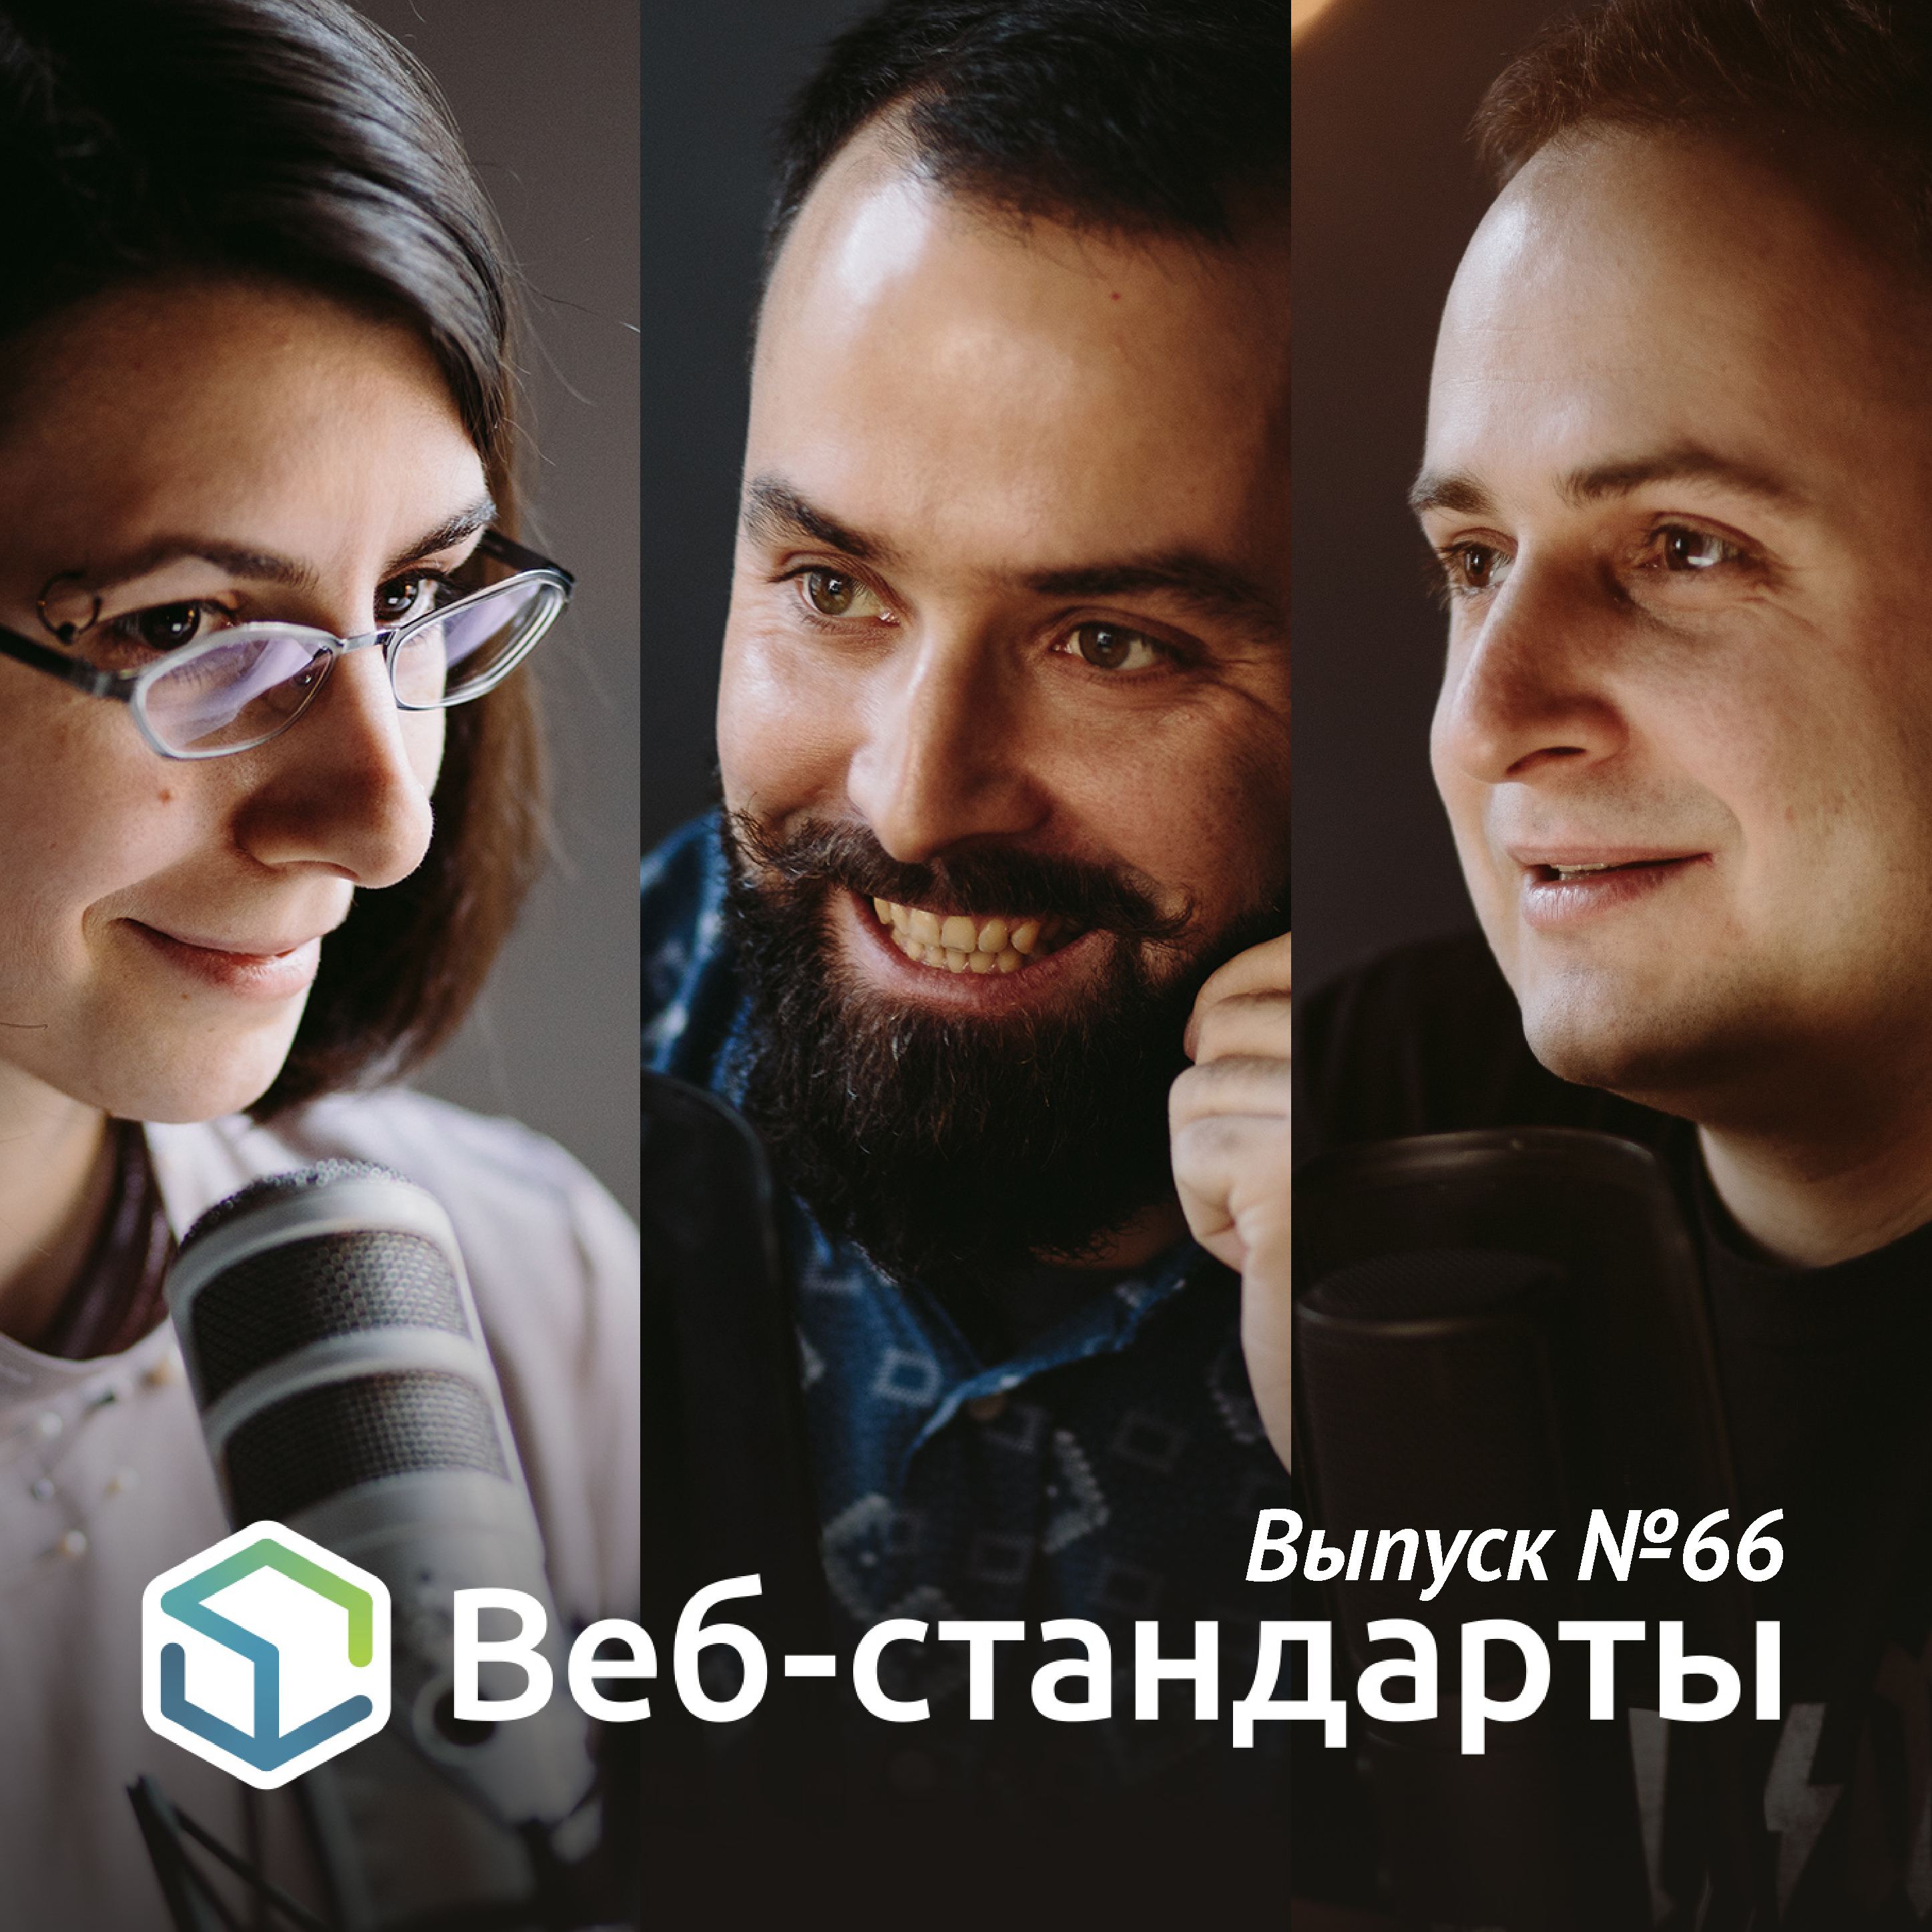 Алексей Симоненко Выпуск №66 sitemap html page 8